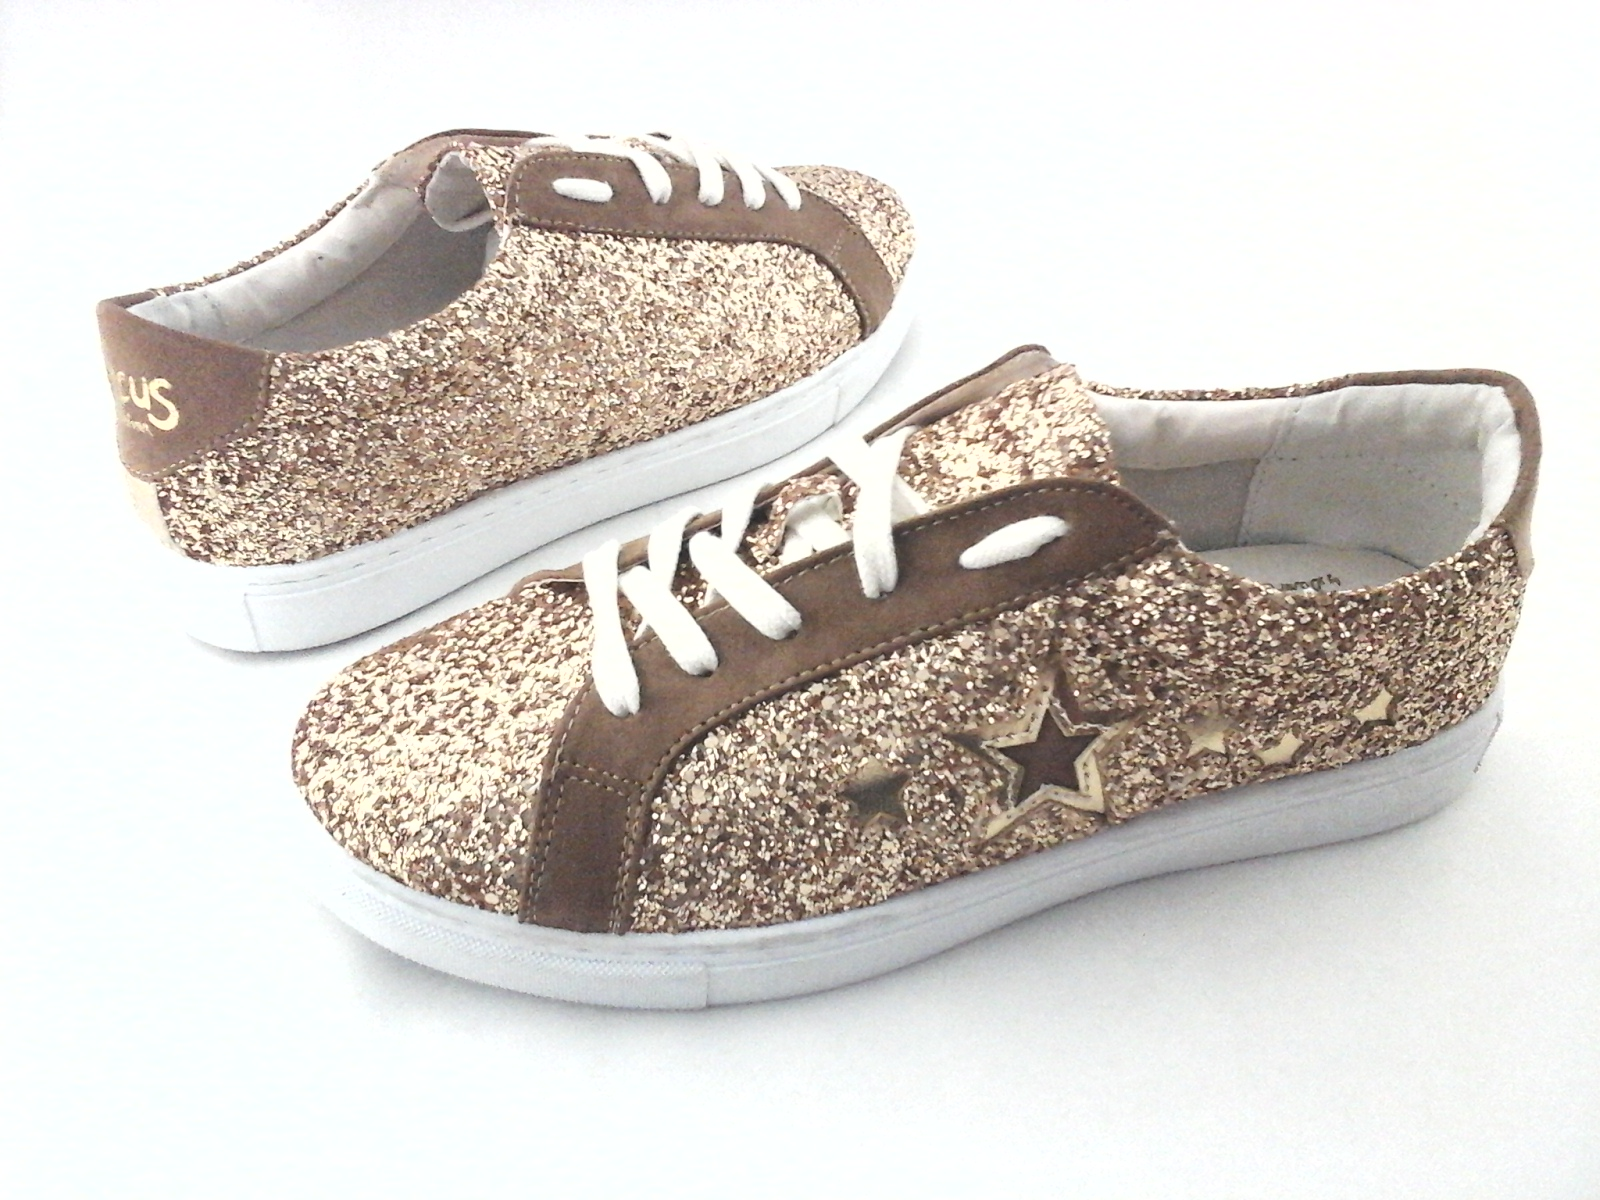 cd2eab78e SAM EDELMAN CIRCUS Sneakers Vanellope-1 Gold Glitter w Stars US 8 EU 38 New